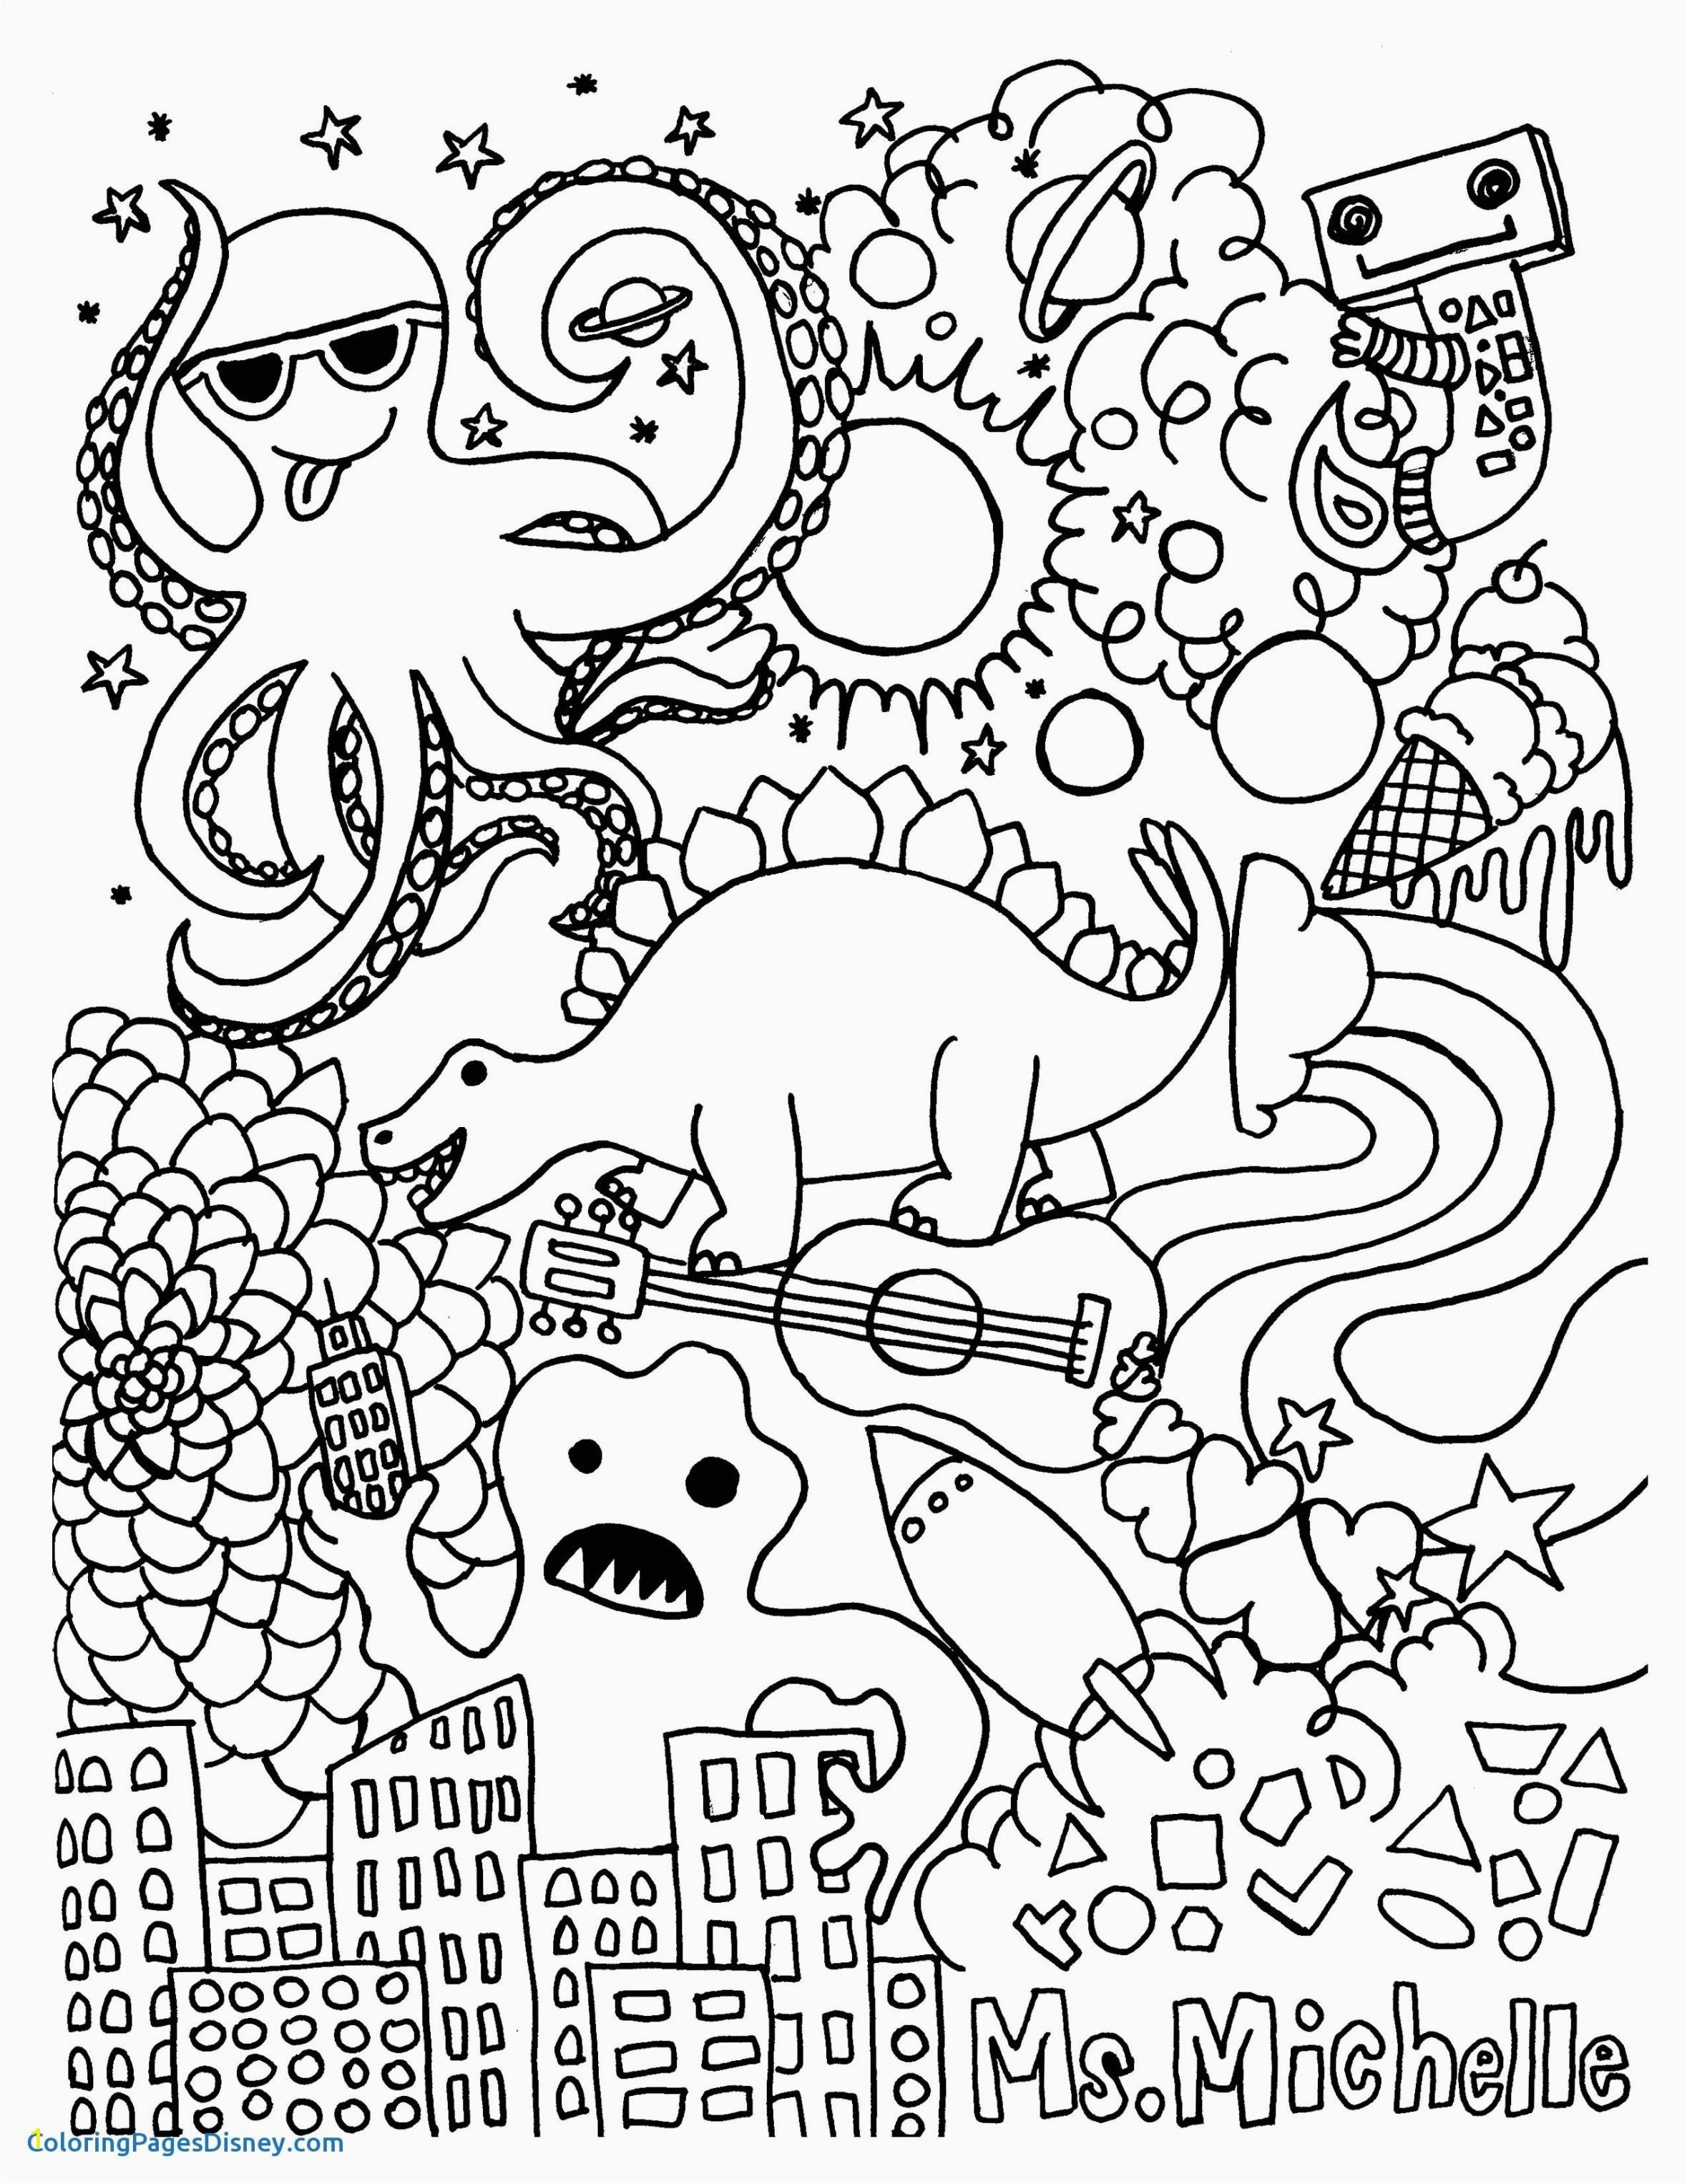 Disney Villains Coloring Pages Best 50 Inspirational Graph Coloring Games Disney Image